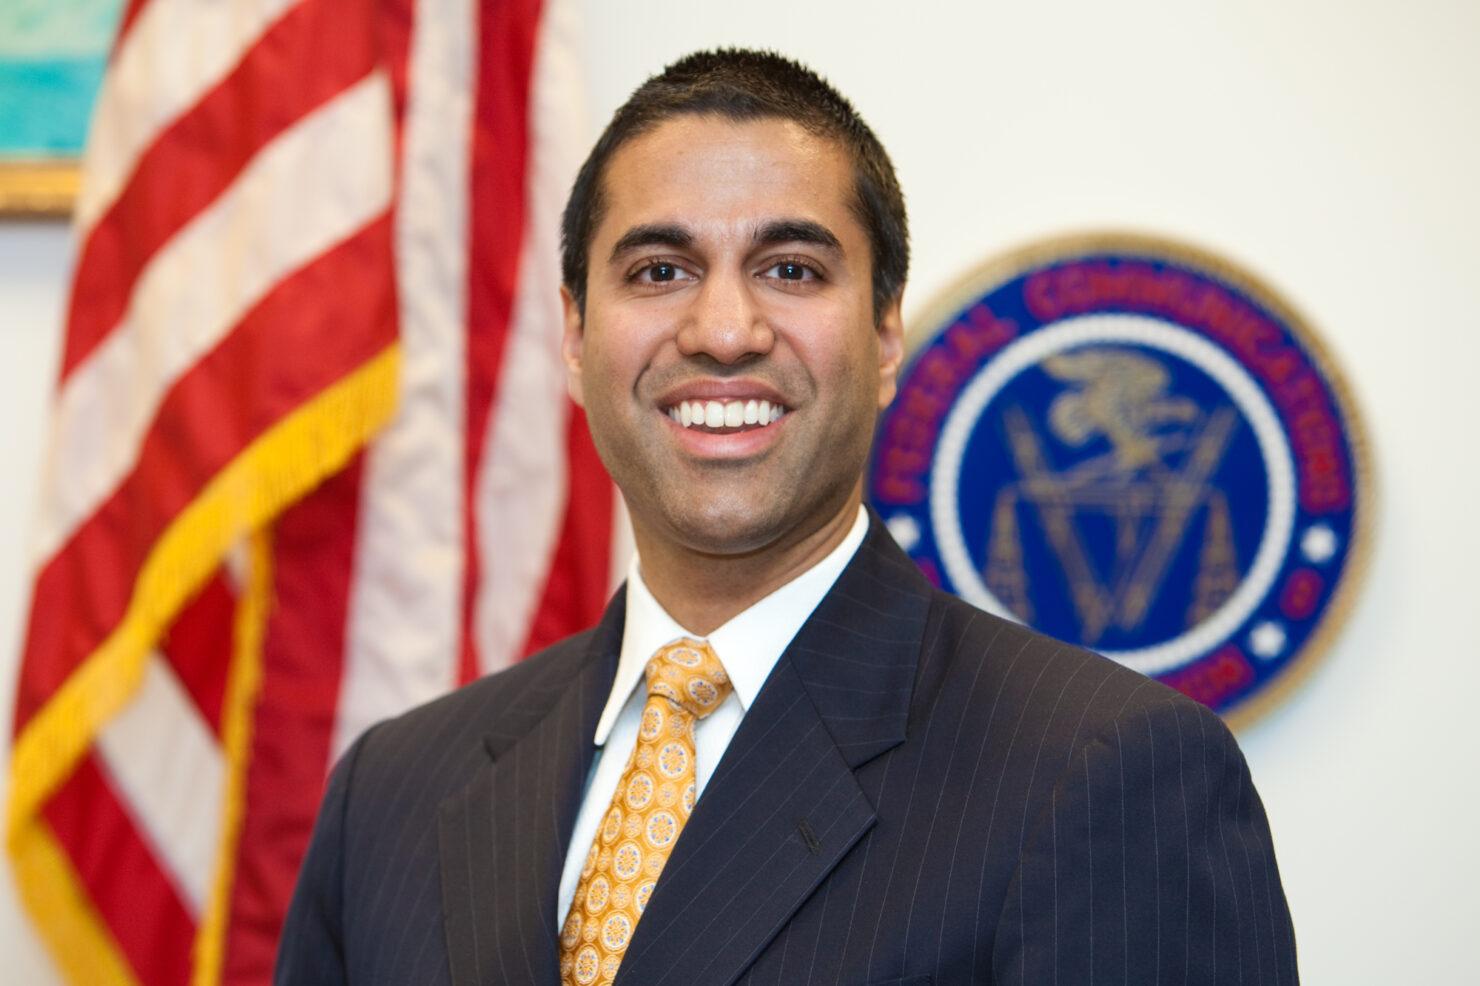 Net neutrality ajit pai FCC cybersecurity